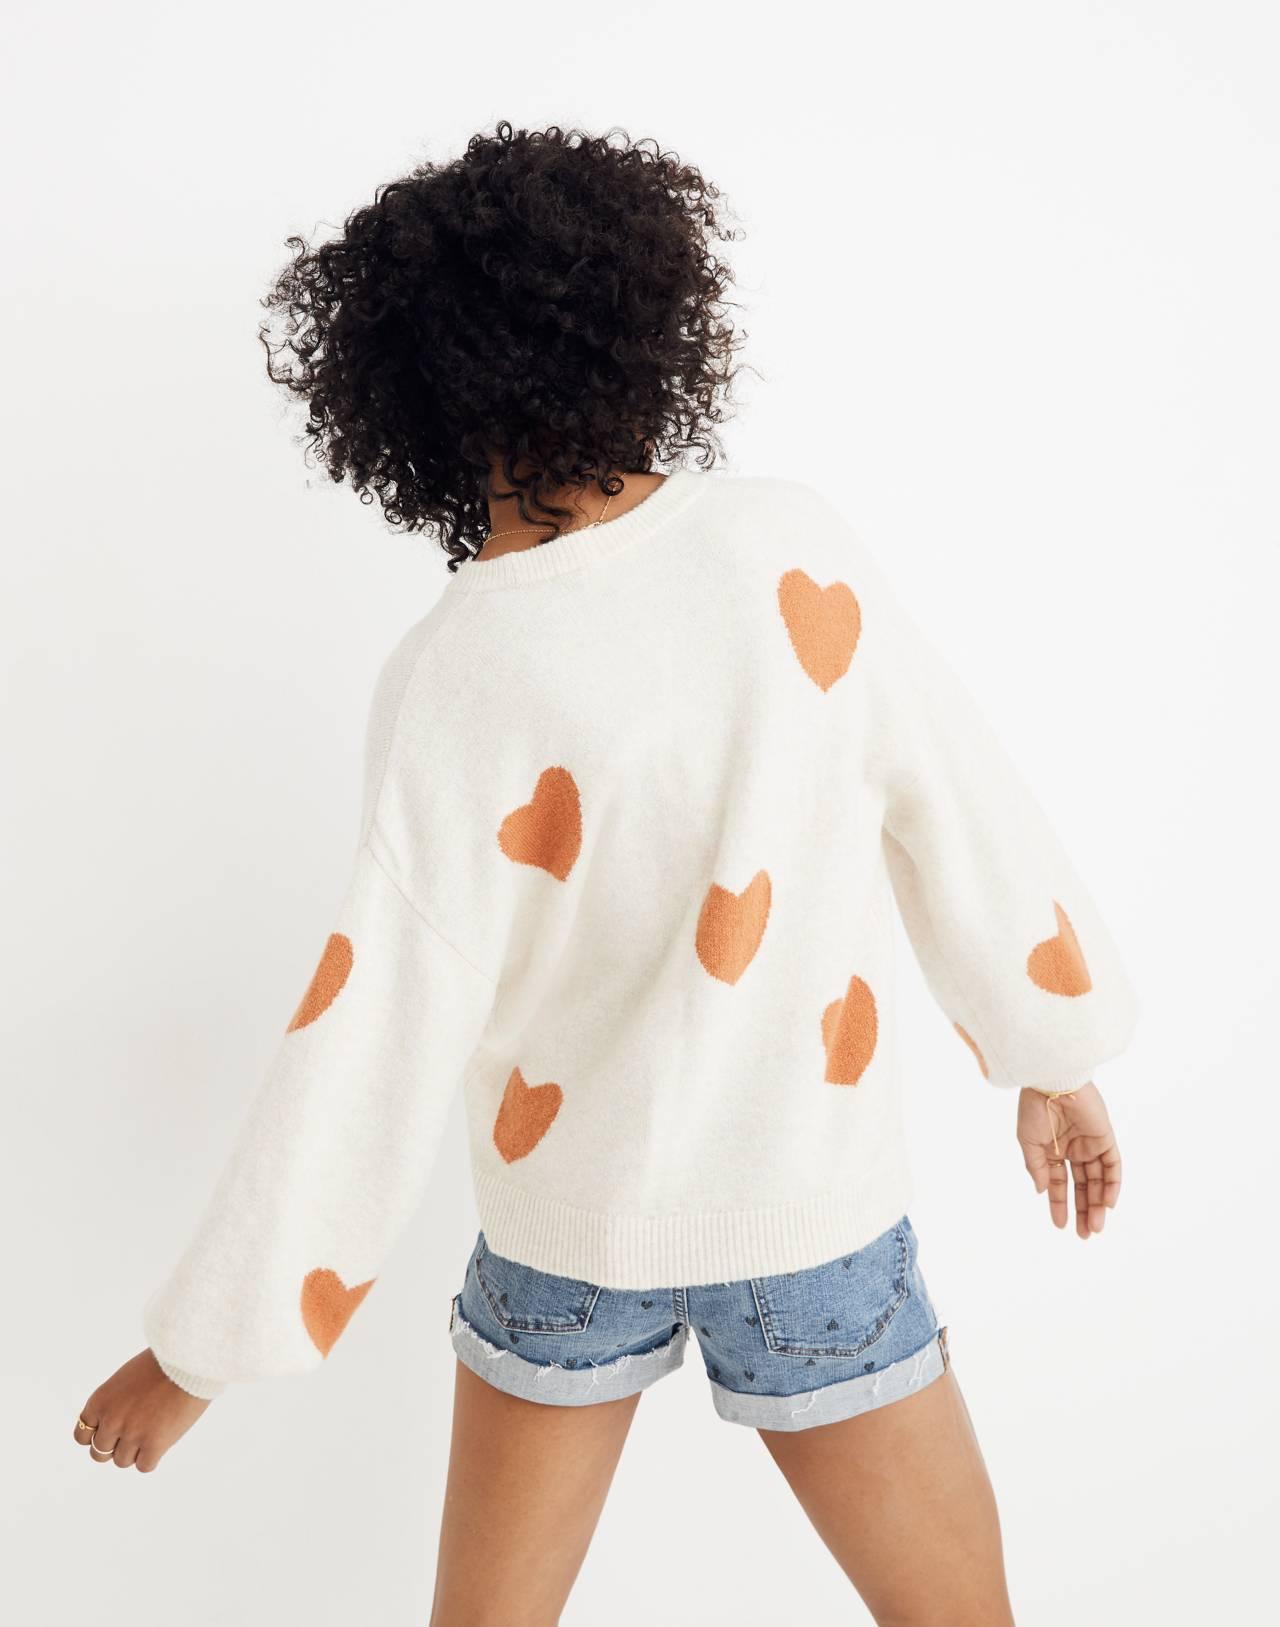 Heart Dot Balloon-Sleeve Pullover Sweater in heather smoke image 3